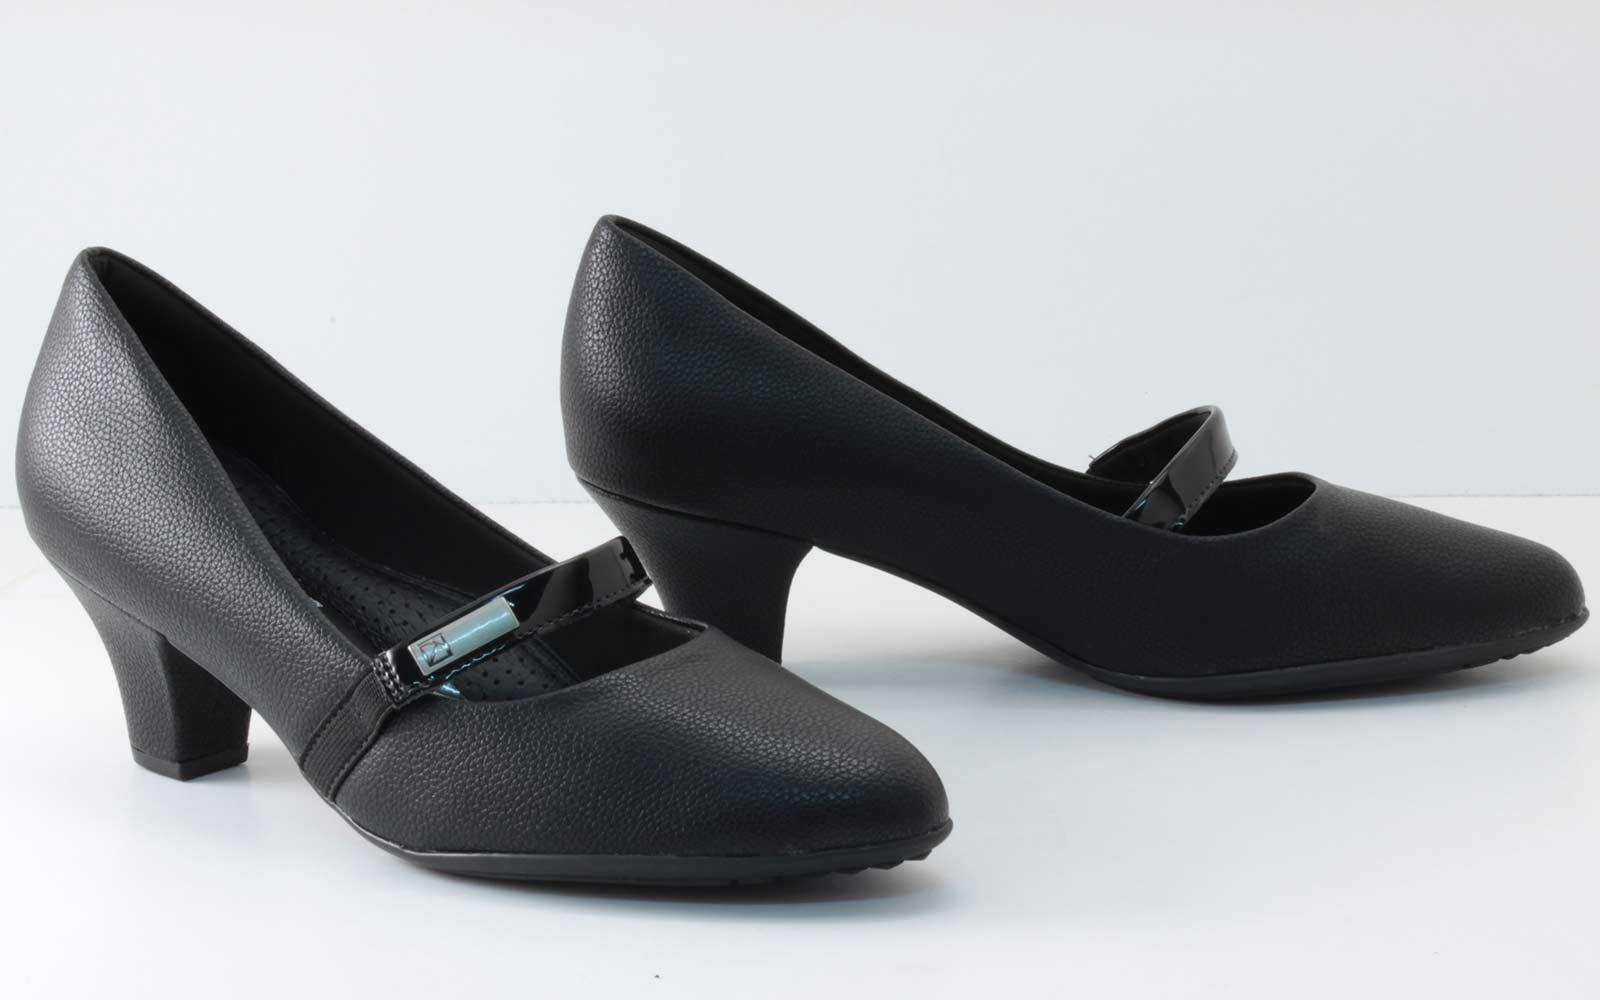 Scarpin Piccadilly Sapato Feminino Boneca 703011  - Ian Calçados